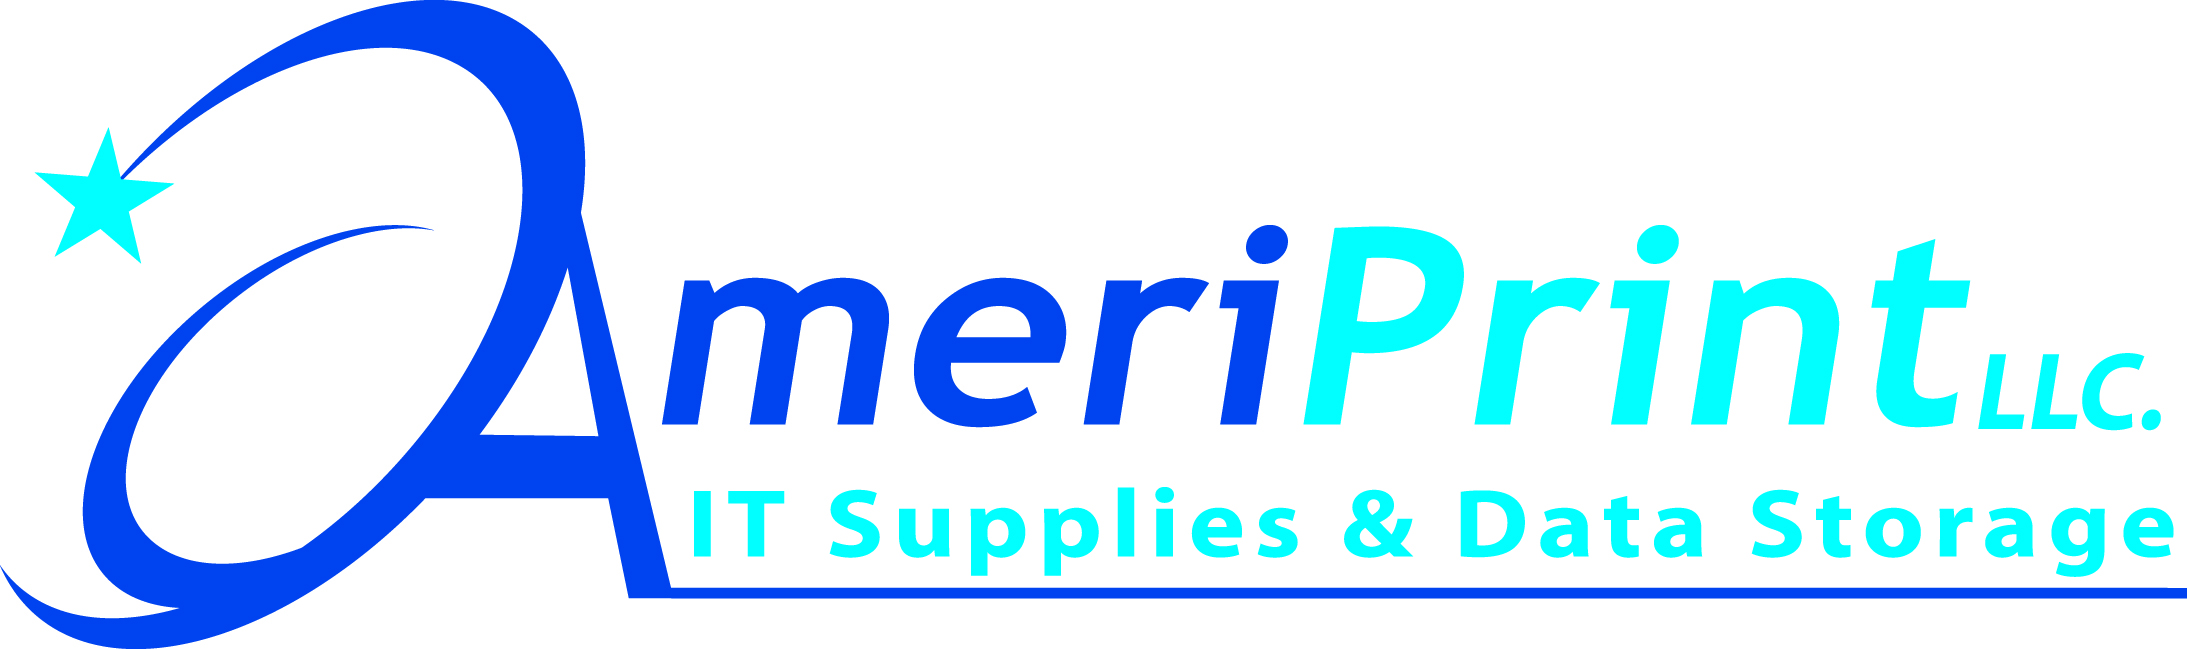 AmeriPrint LLC, IT Supplies & Data Storage